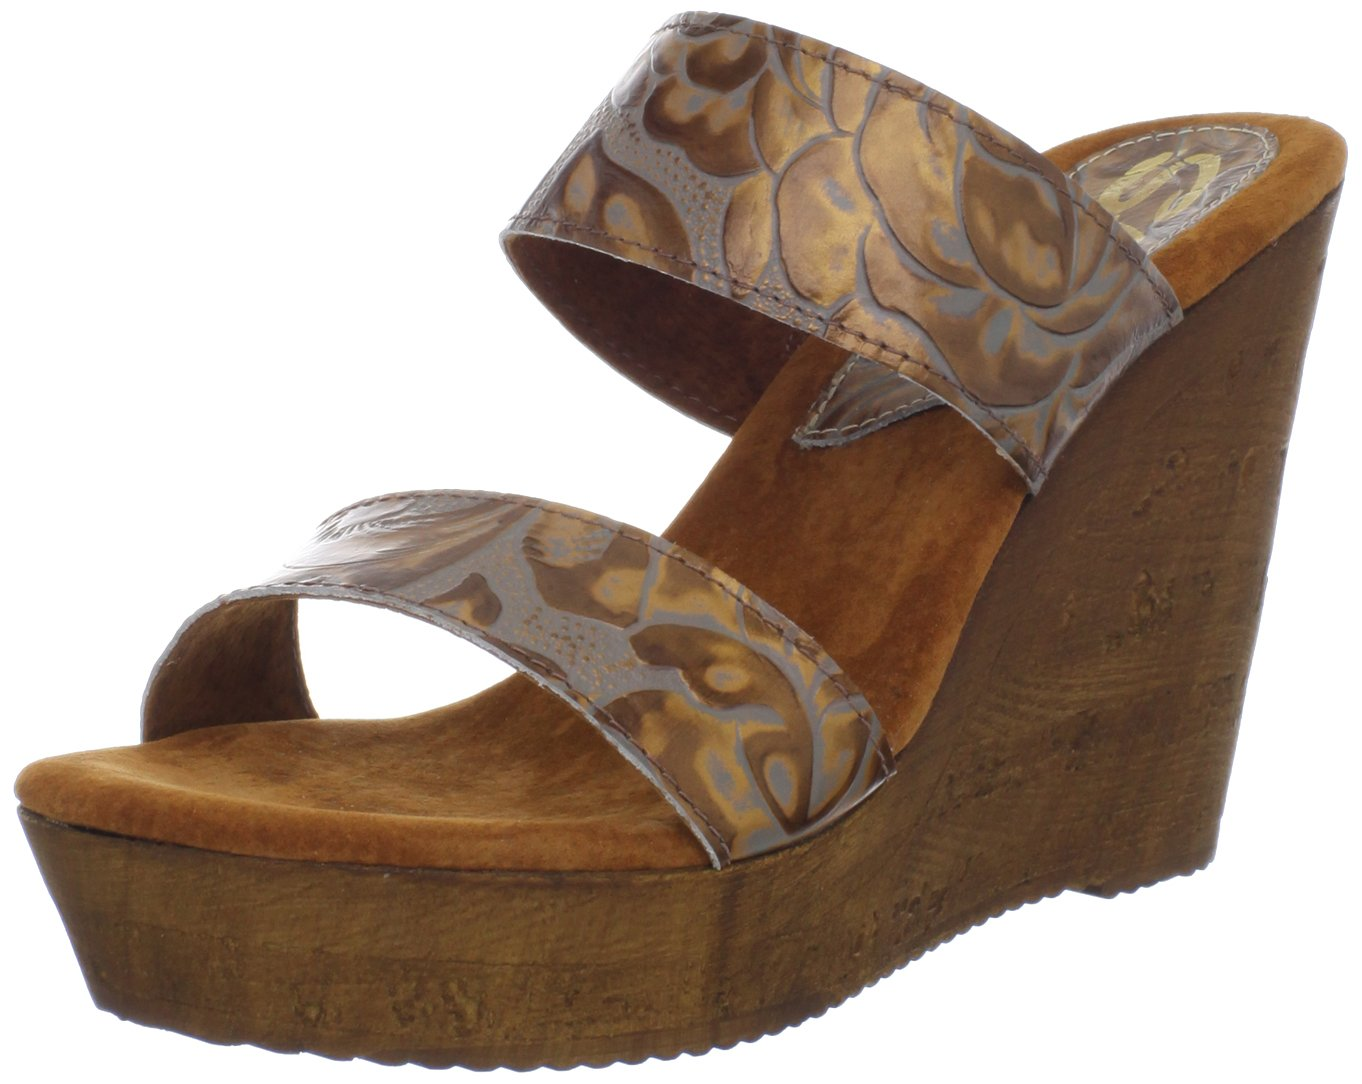 Sbicca Women's Credence Wedge Sandal B009JYYNJM 9 B(M) US|Bronze